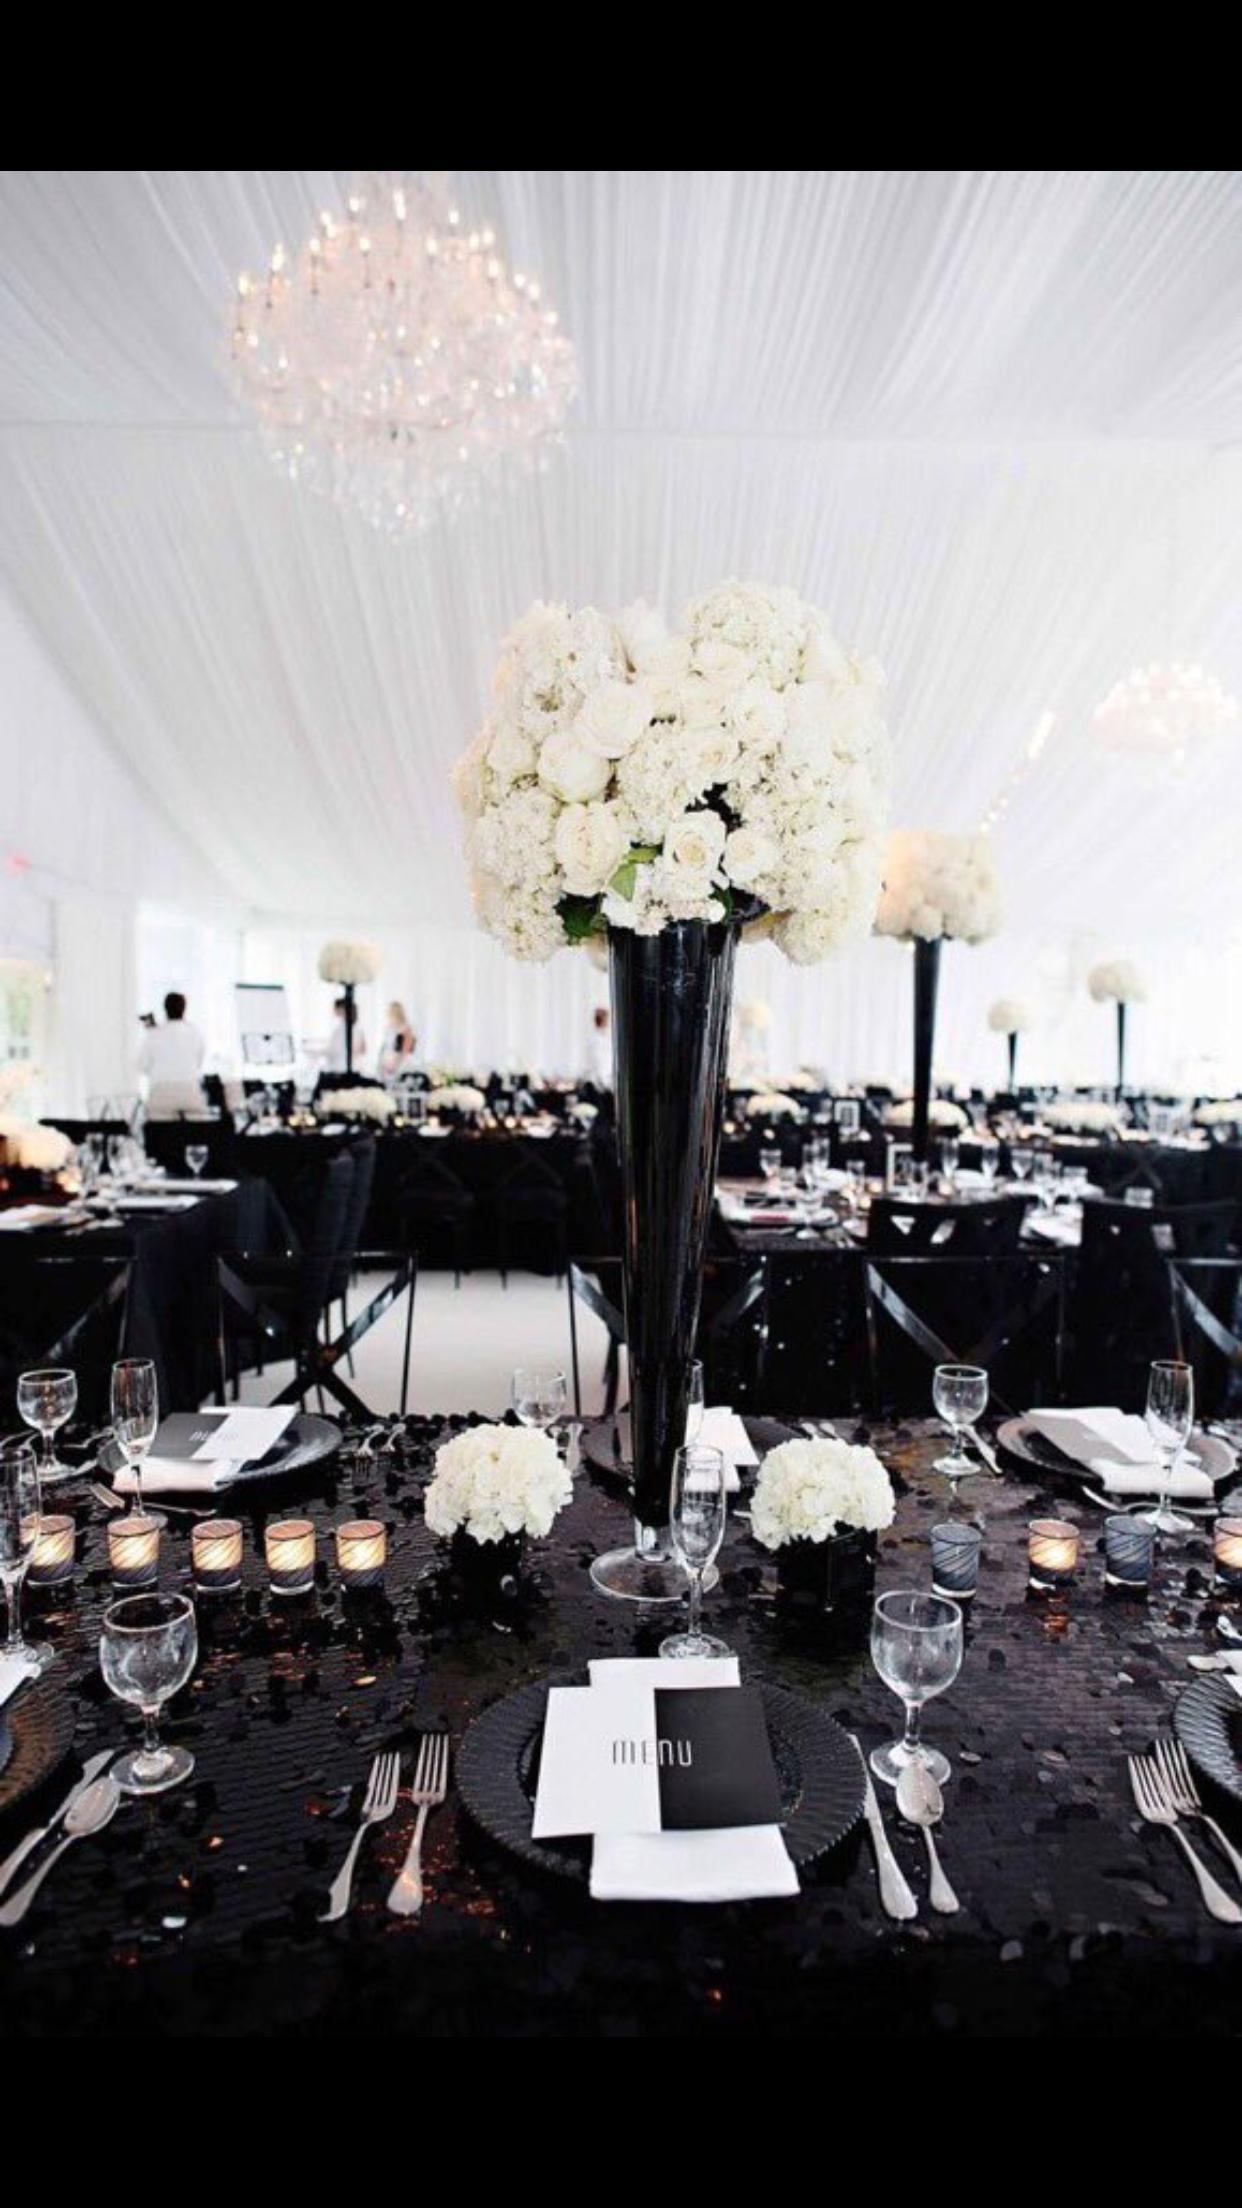 Pin by Destinee Miller on Wedding Day | Pinterest | Wedding